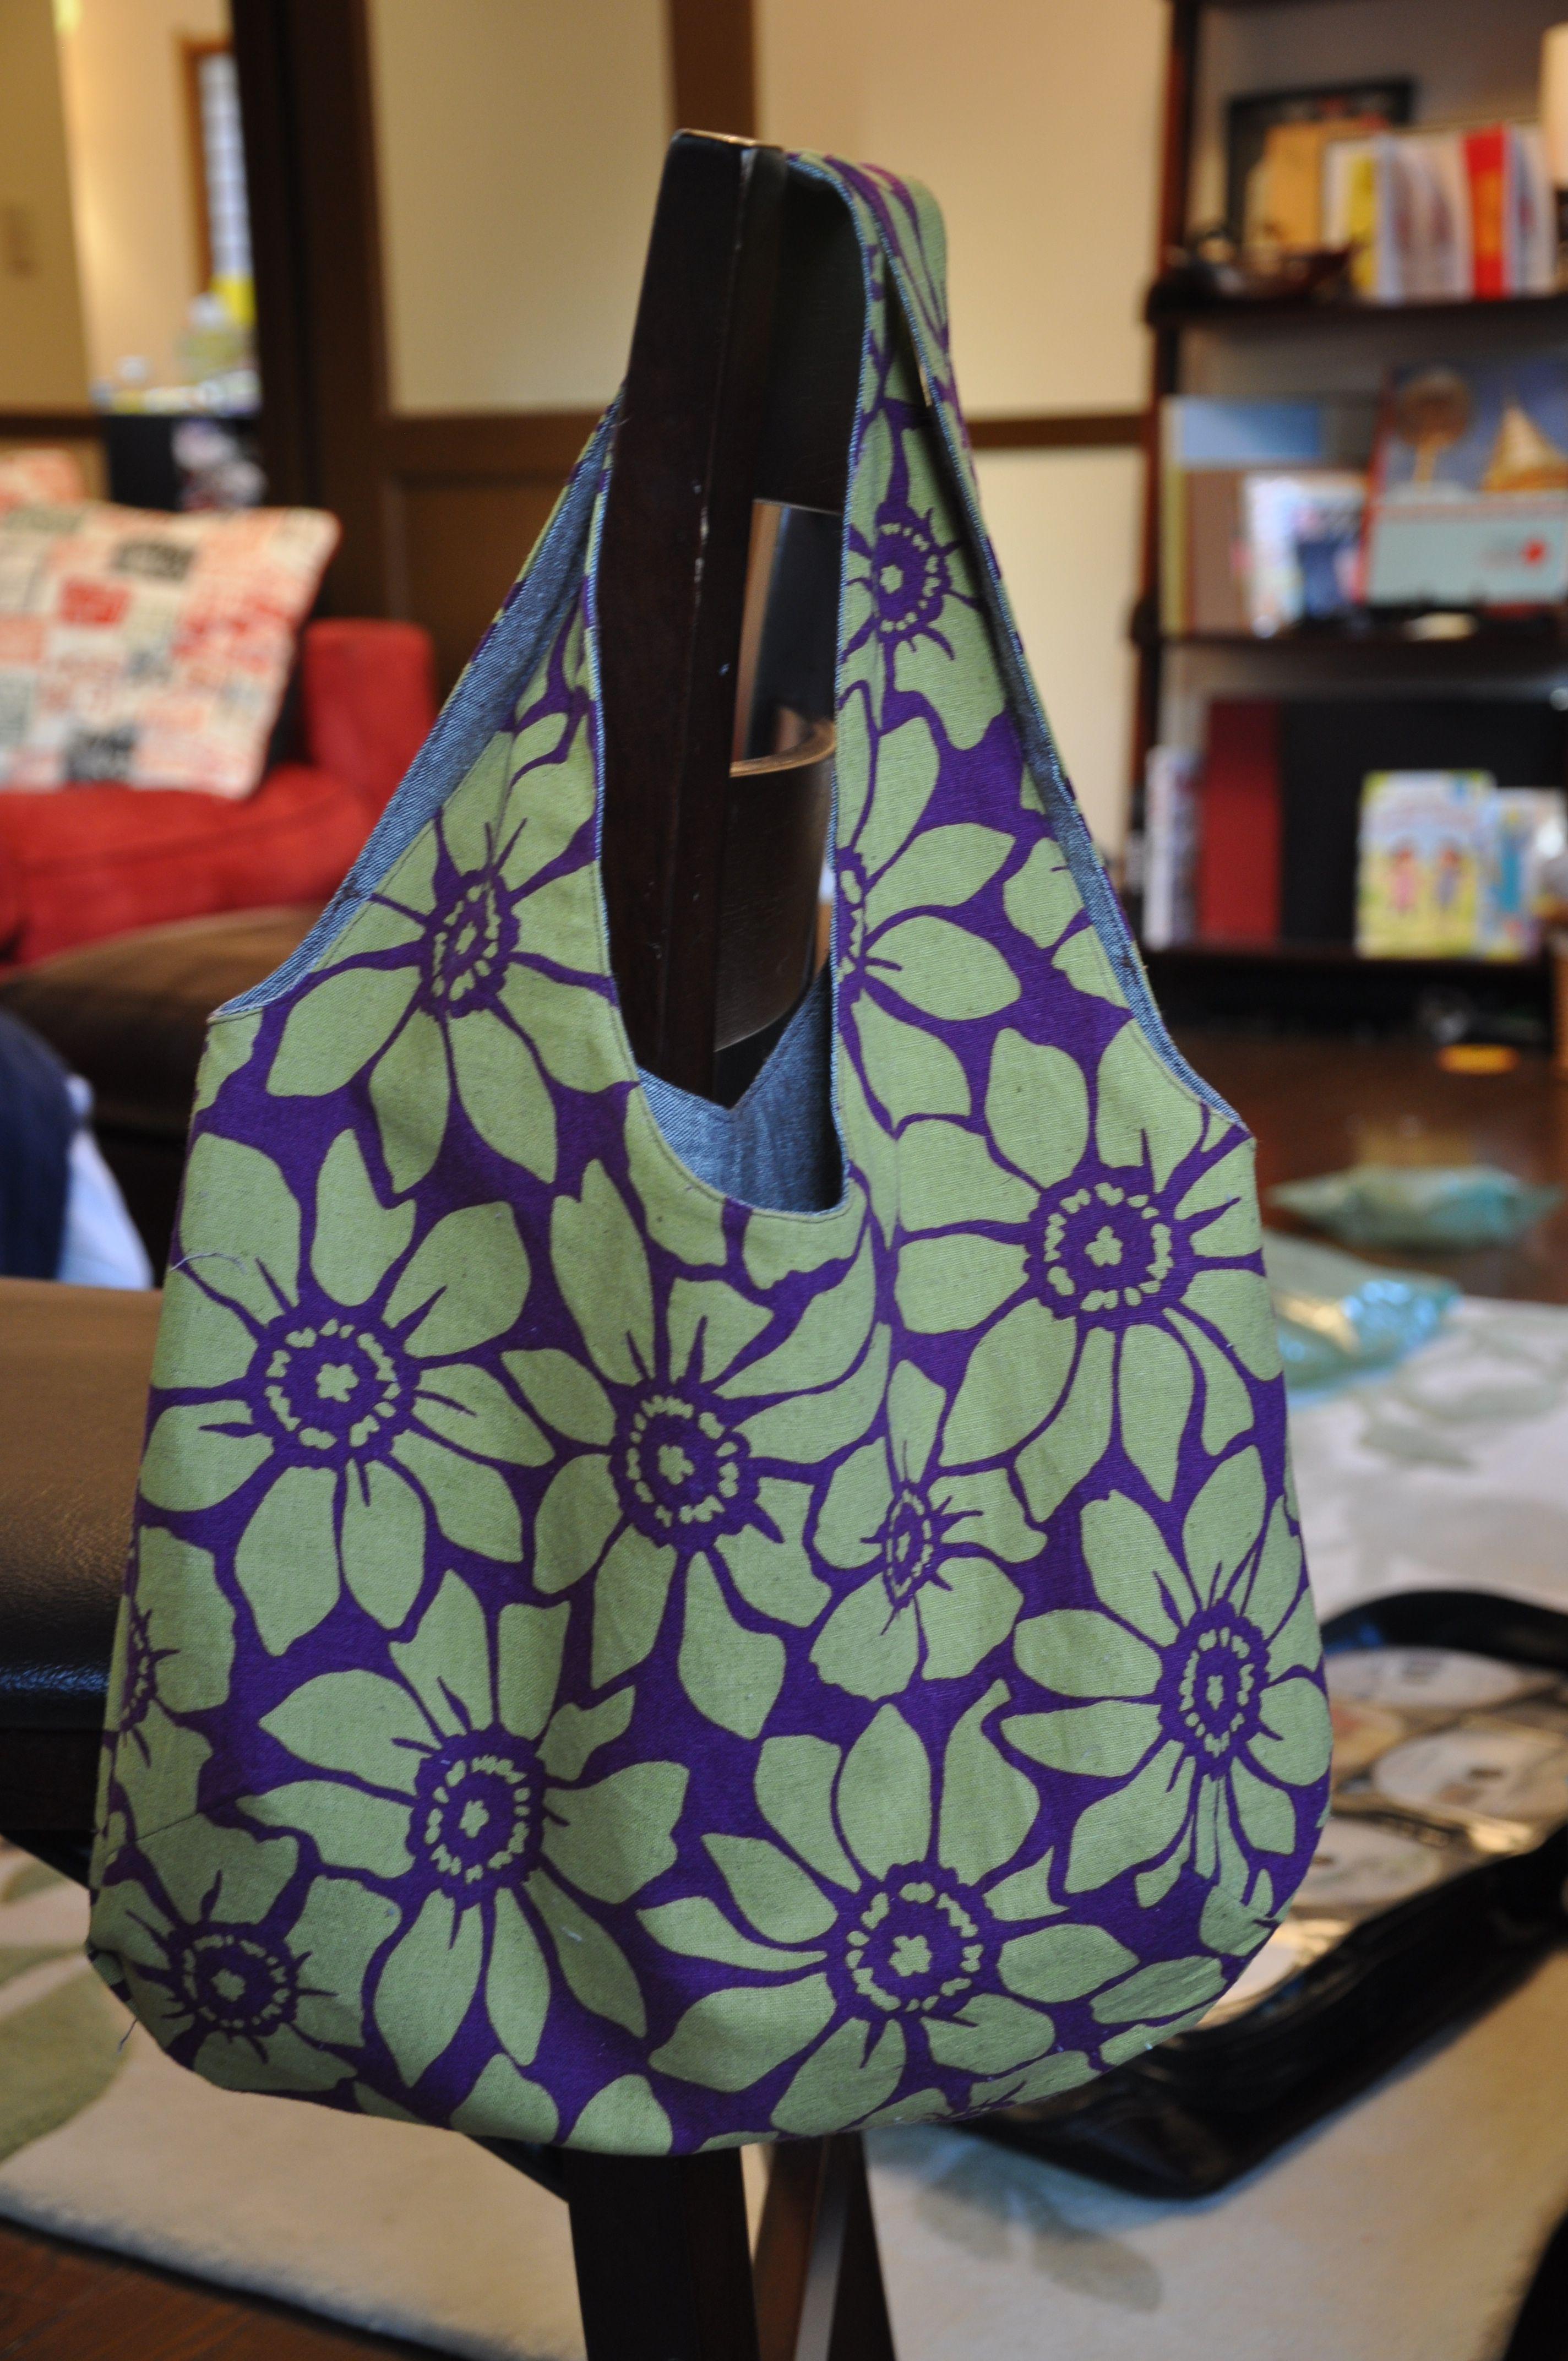 Reversible bag using free tutorial found at http